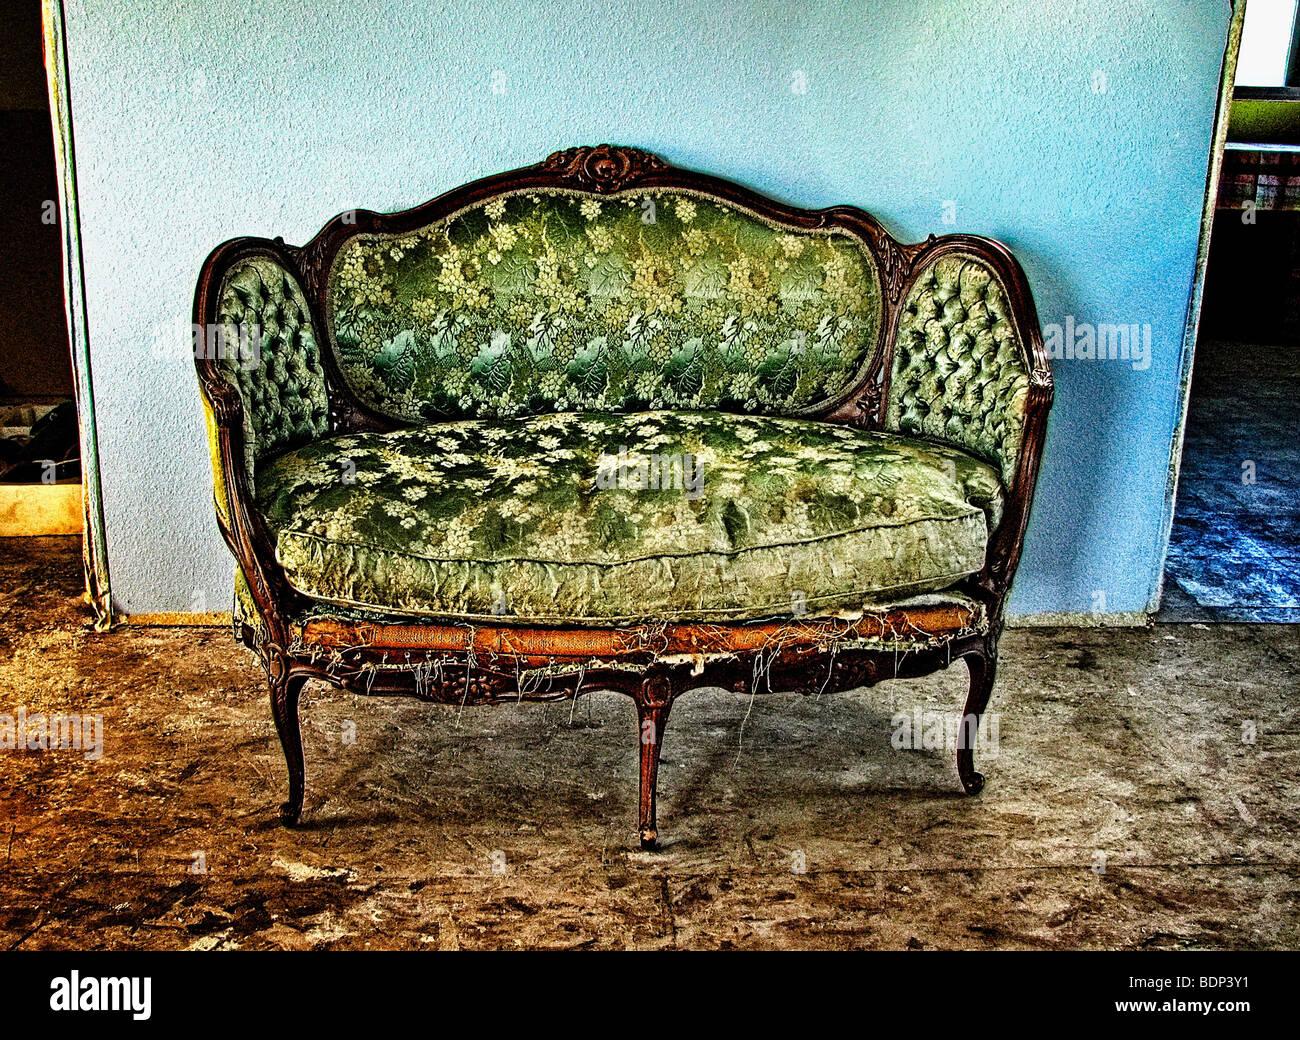 An old tatty sofa - Stock Image